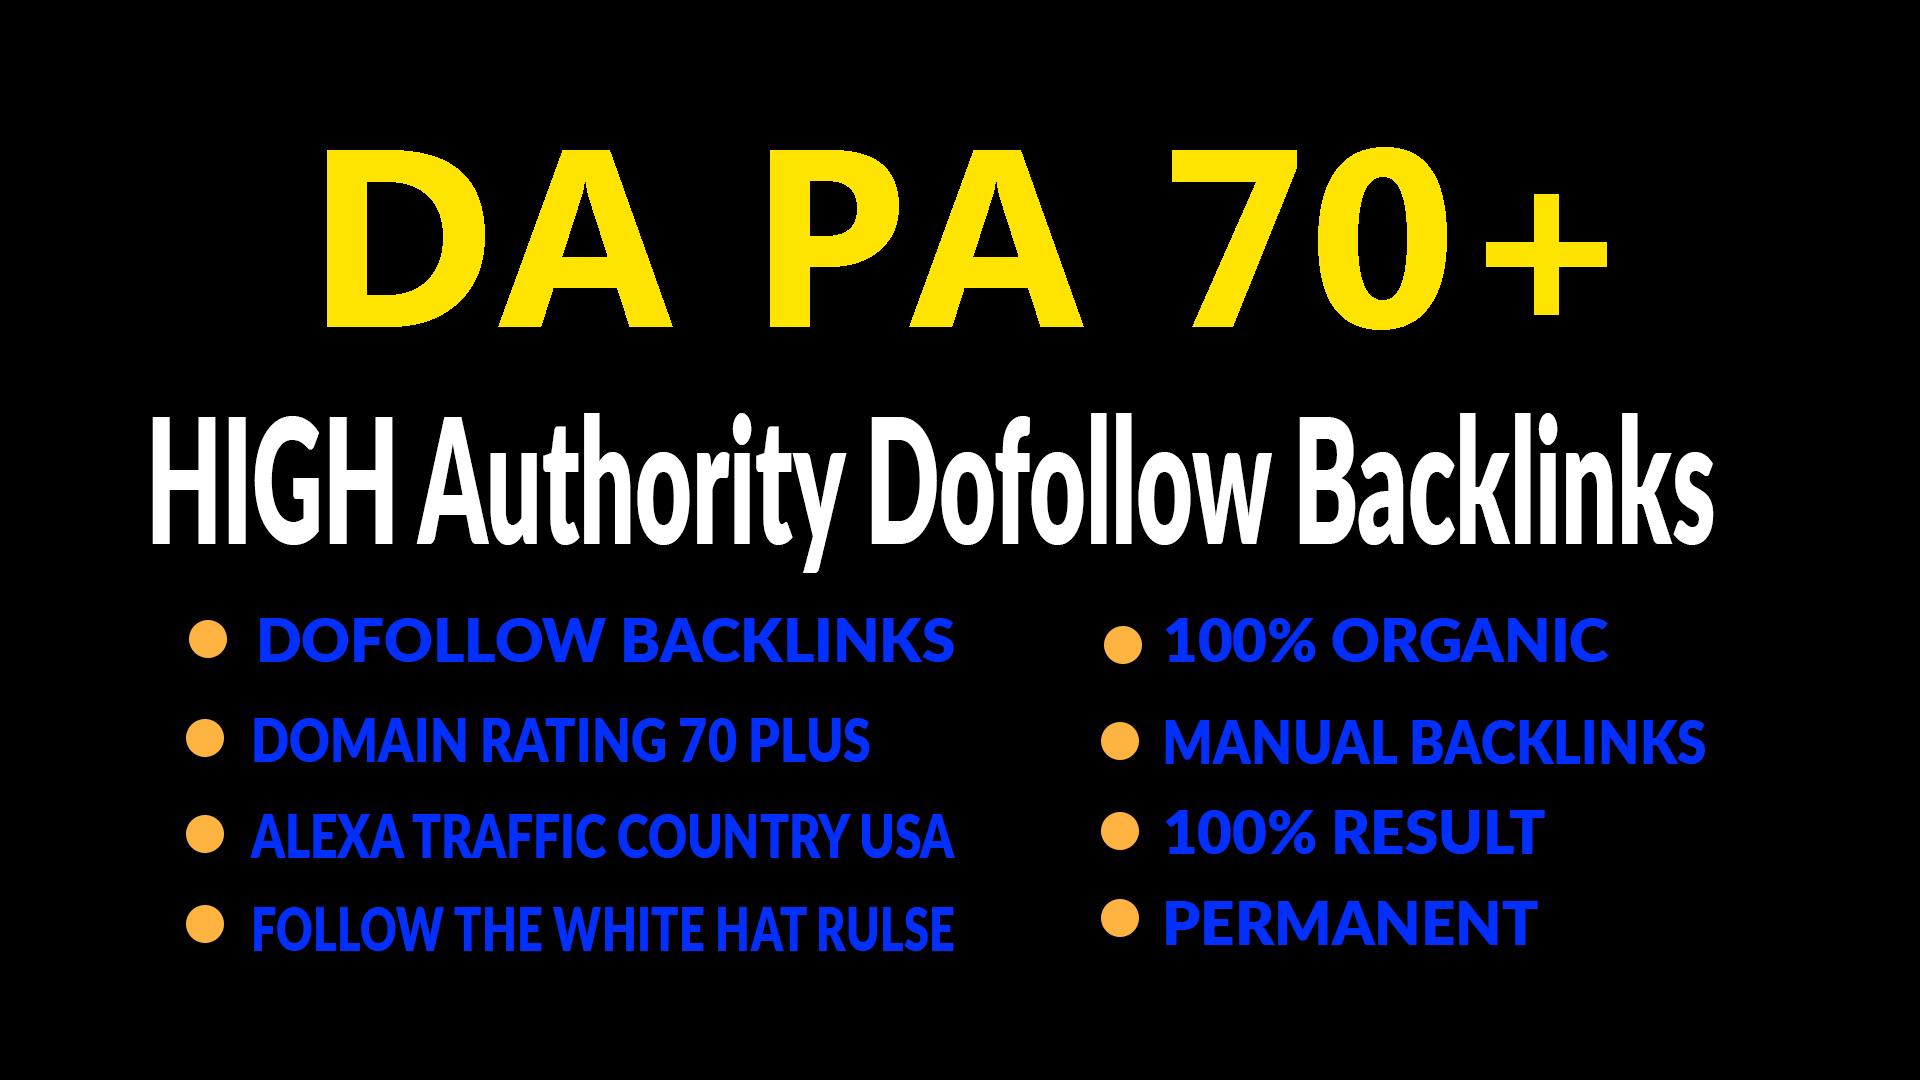 provide 25 DA PA 70 plus high quality dofollow backlinks for seo